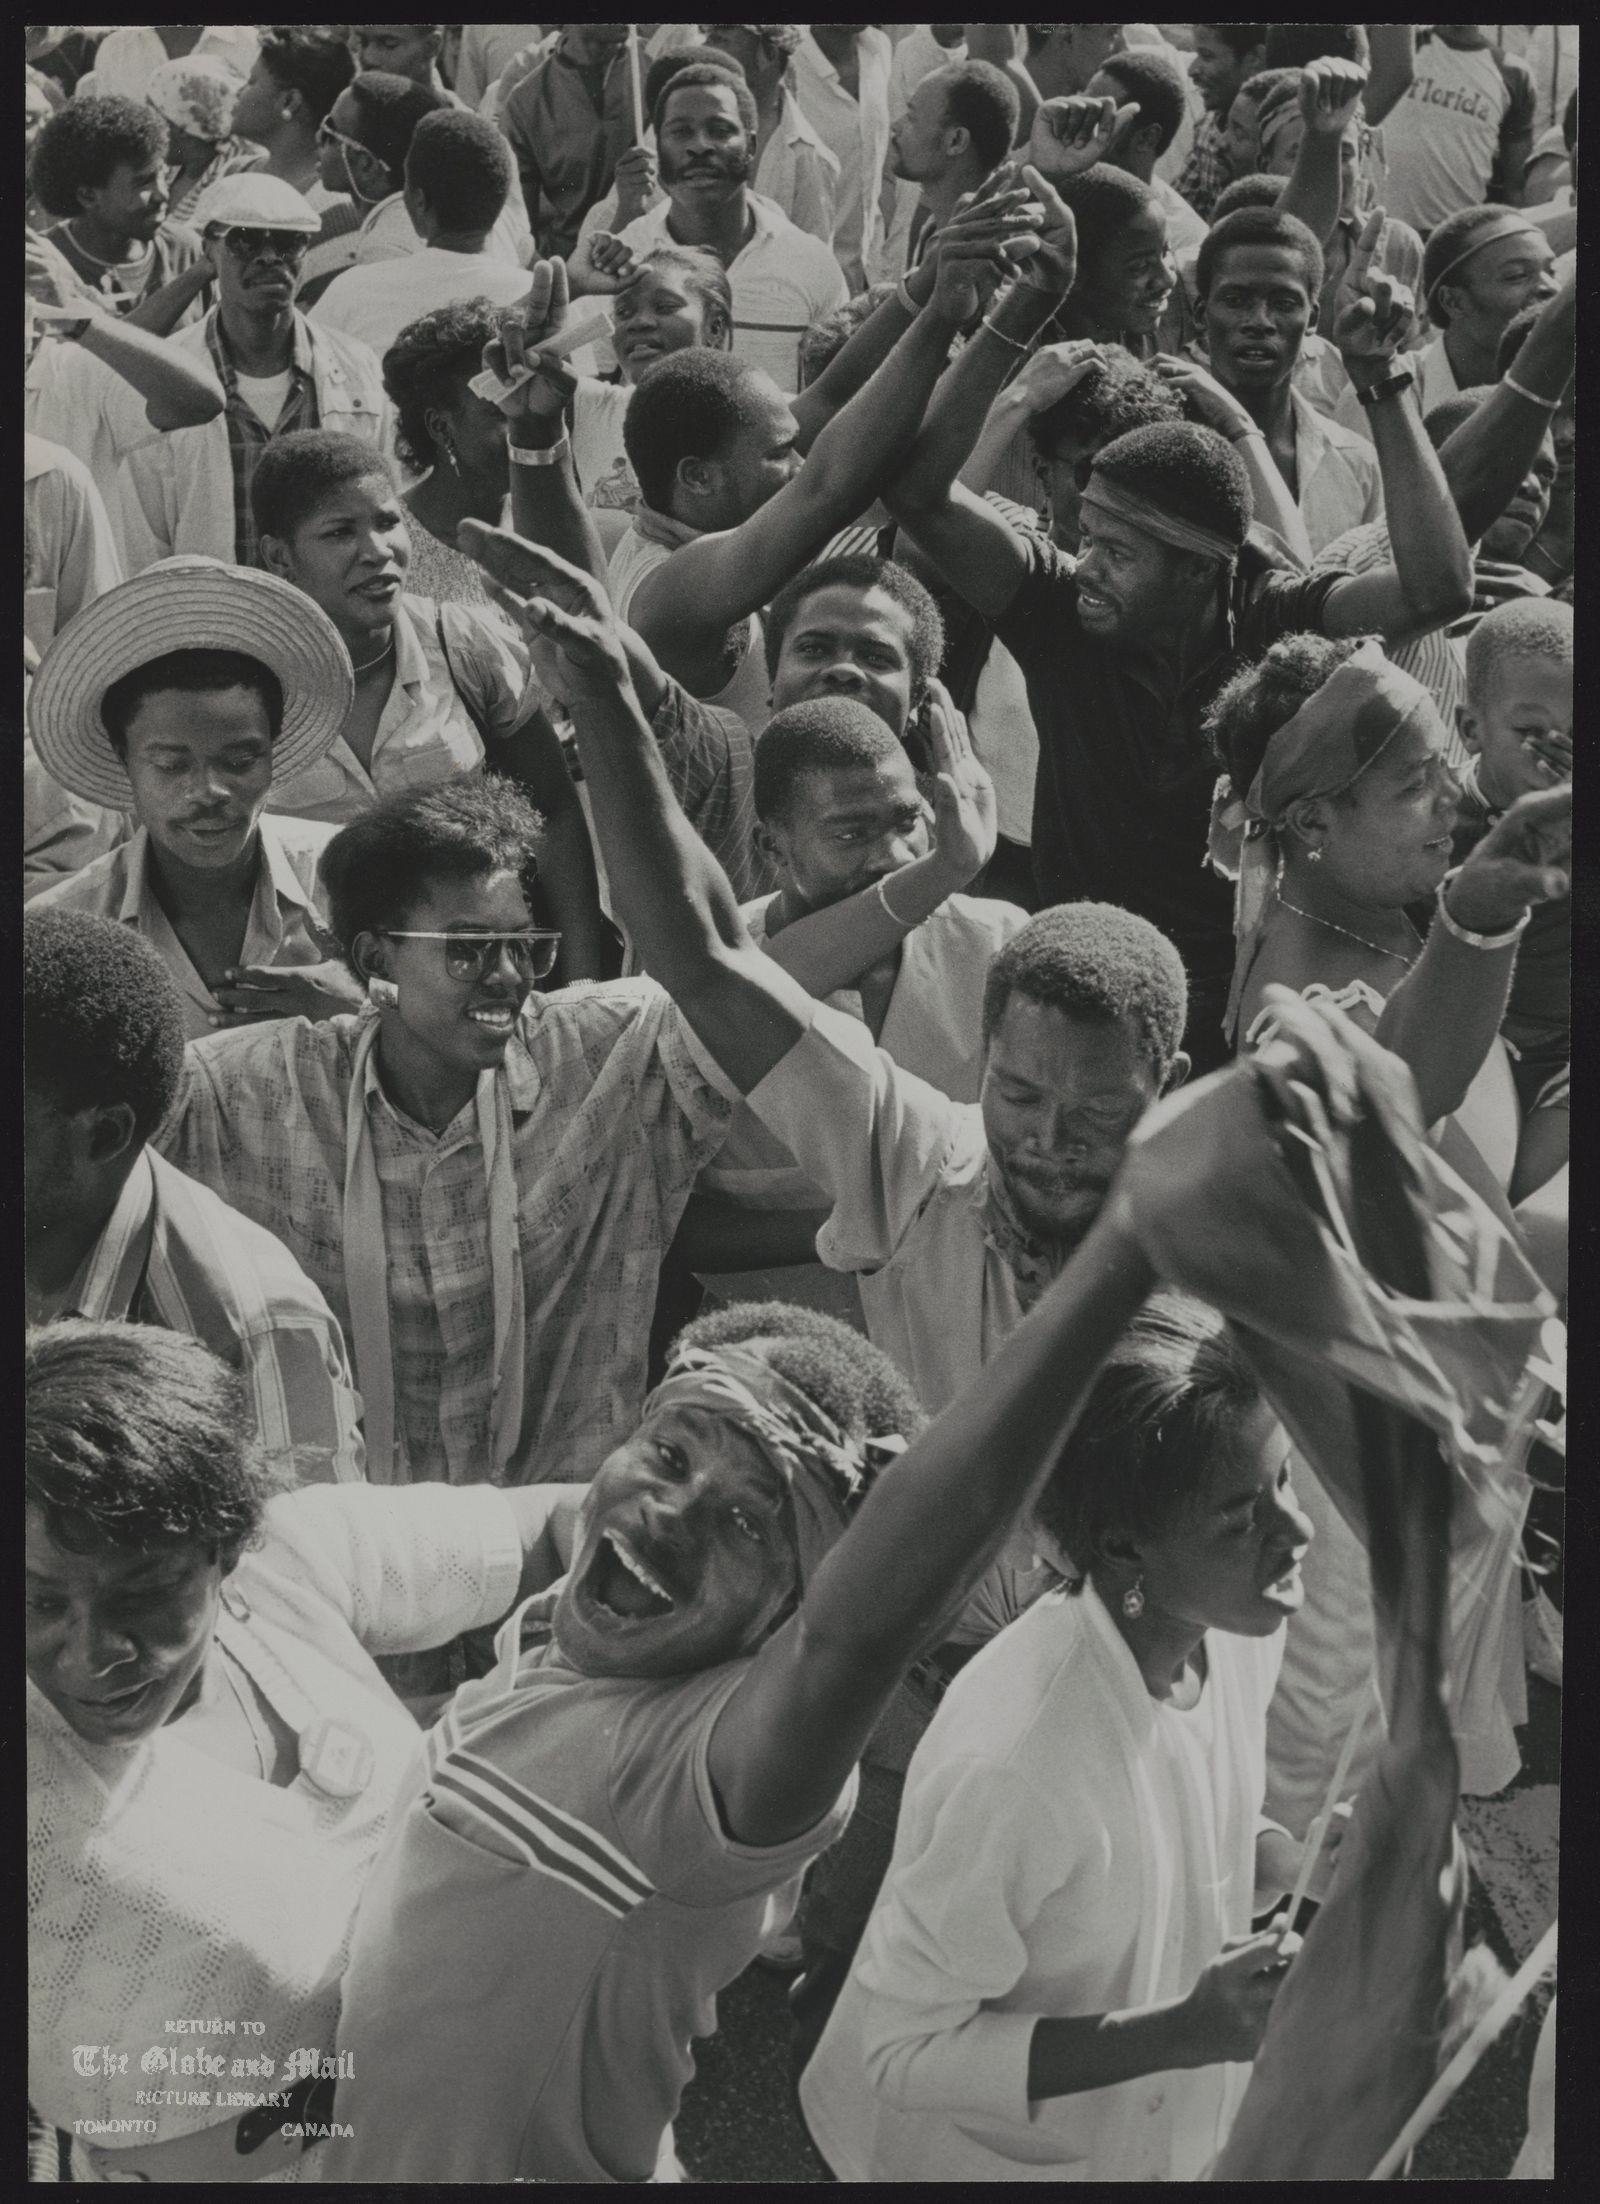 REFUGEES Haiti Haitians celebrating in Miami's Little Haiti, the departure of president for life Jean-Claude Duvalier. Photo: Tom Szlukovenyi Feb 7/86